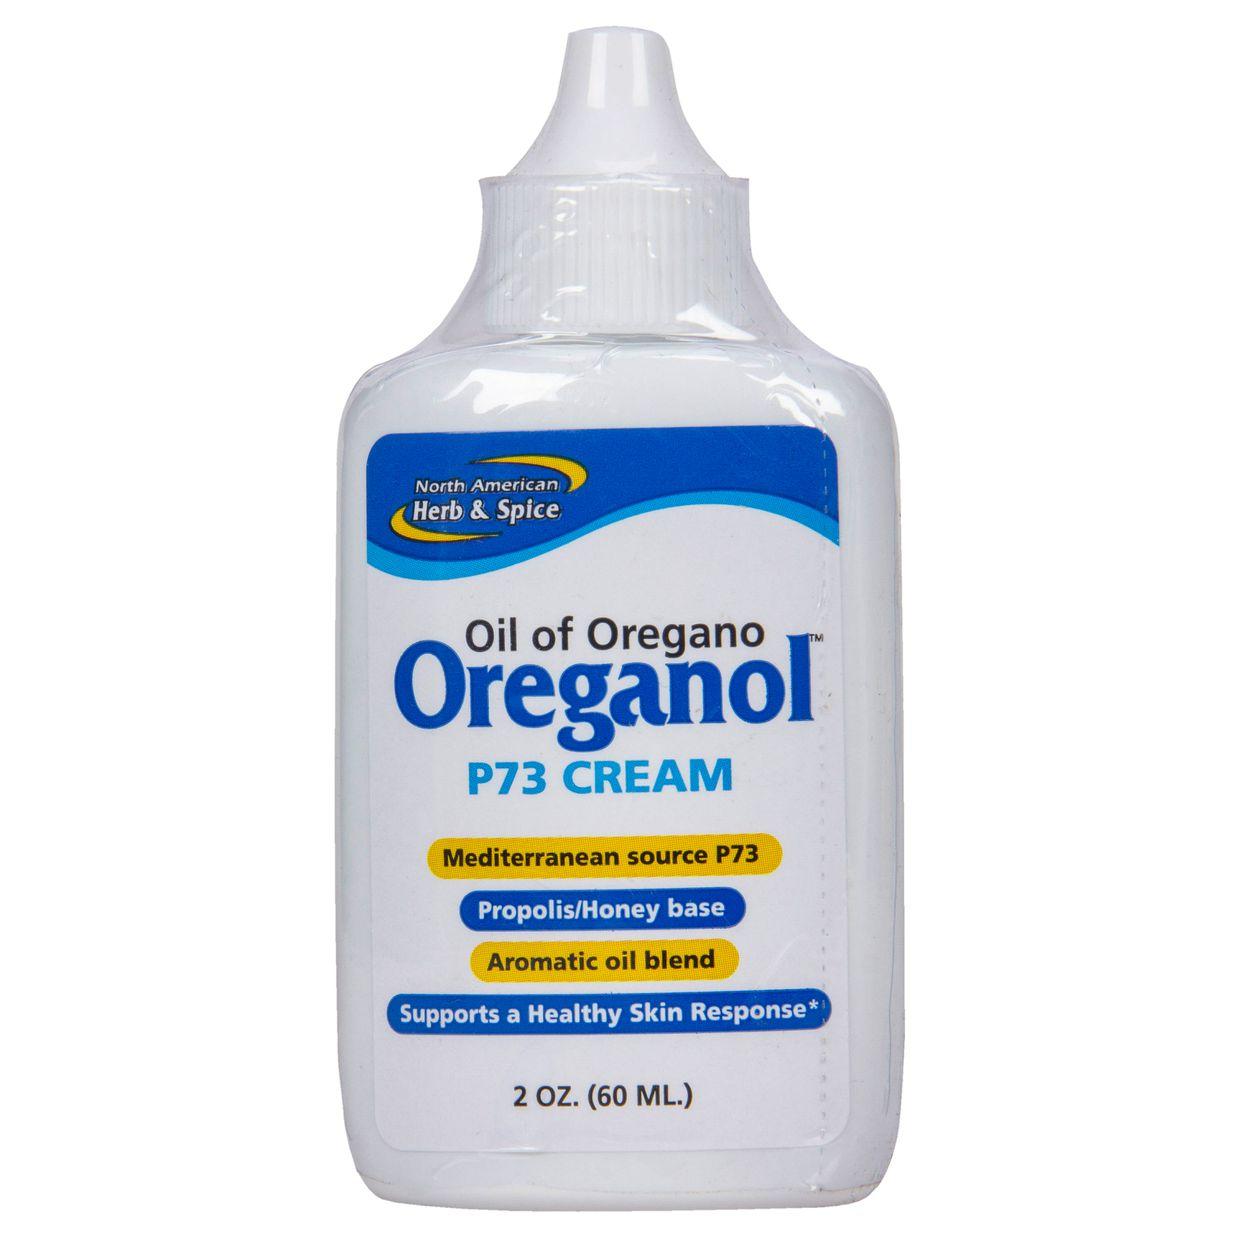 North American Herb Spice Oreganol P73 Cream Azure Standard